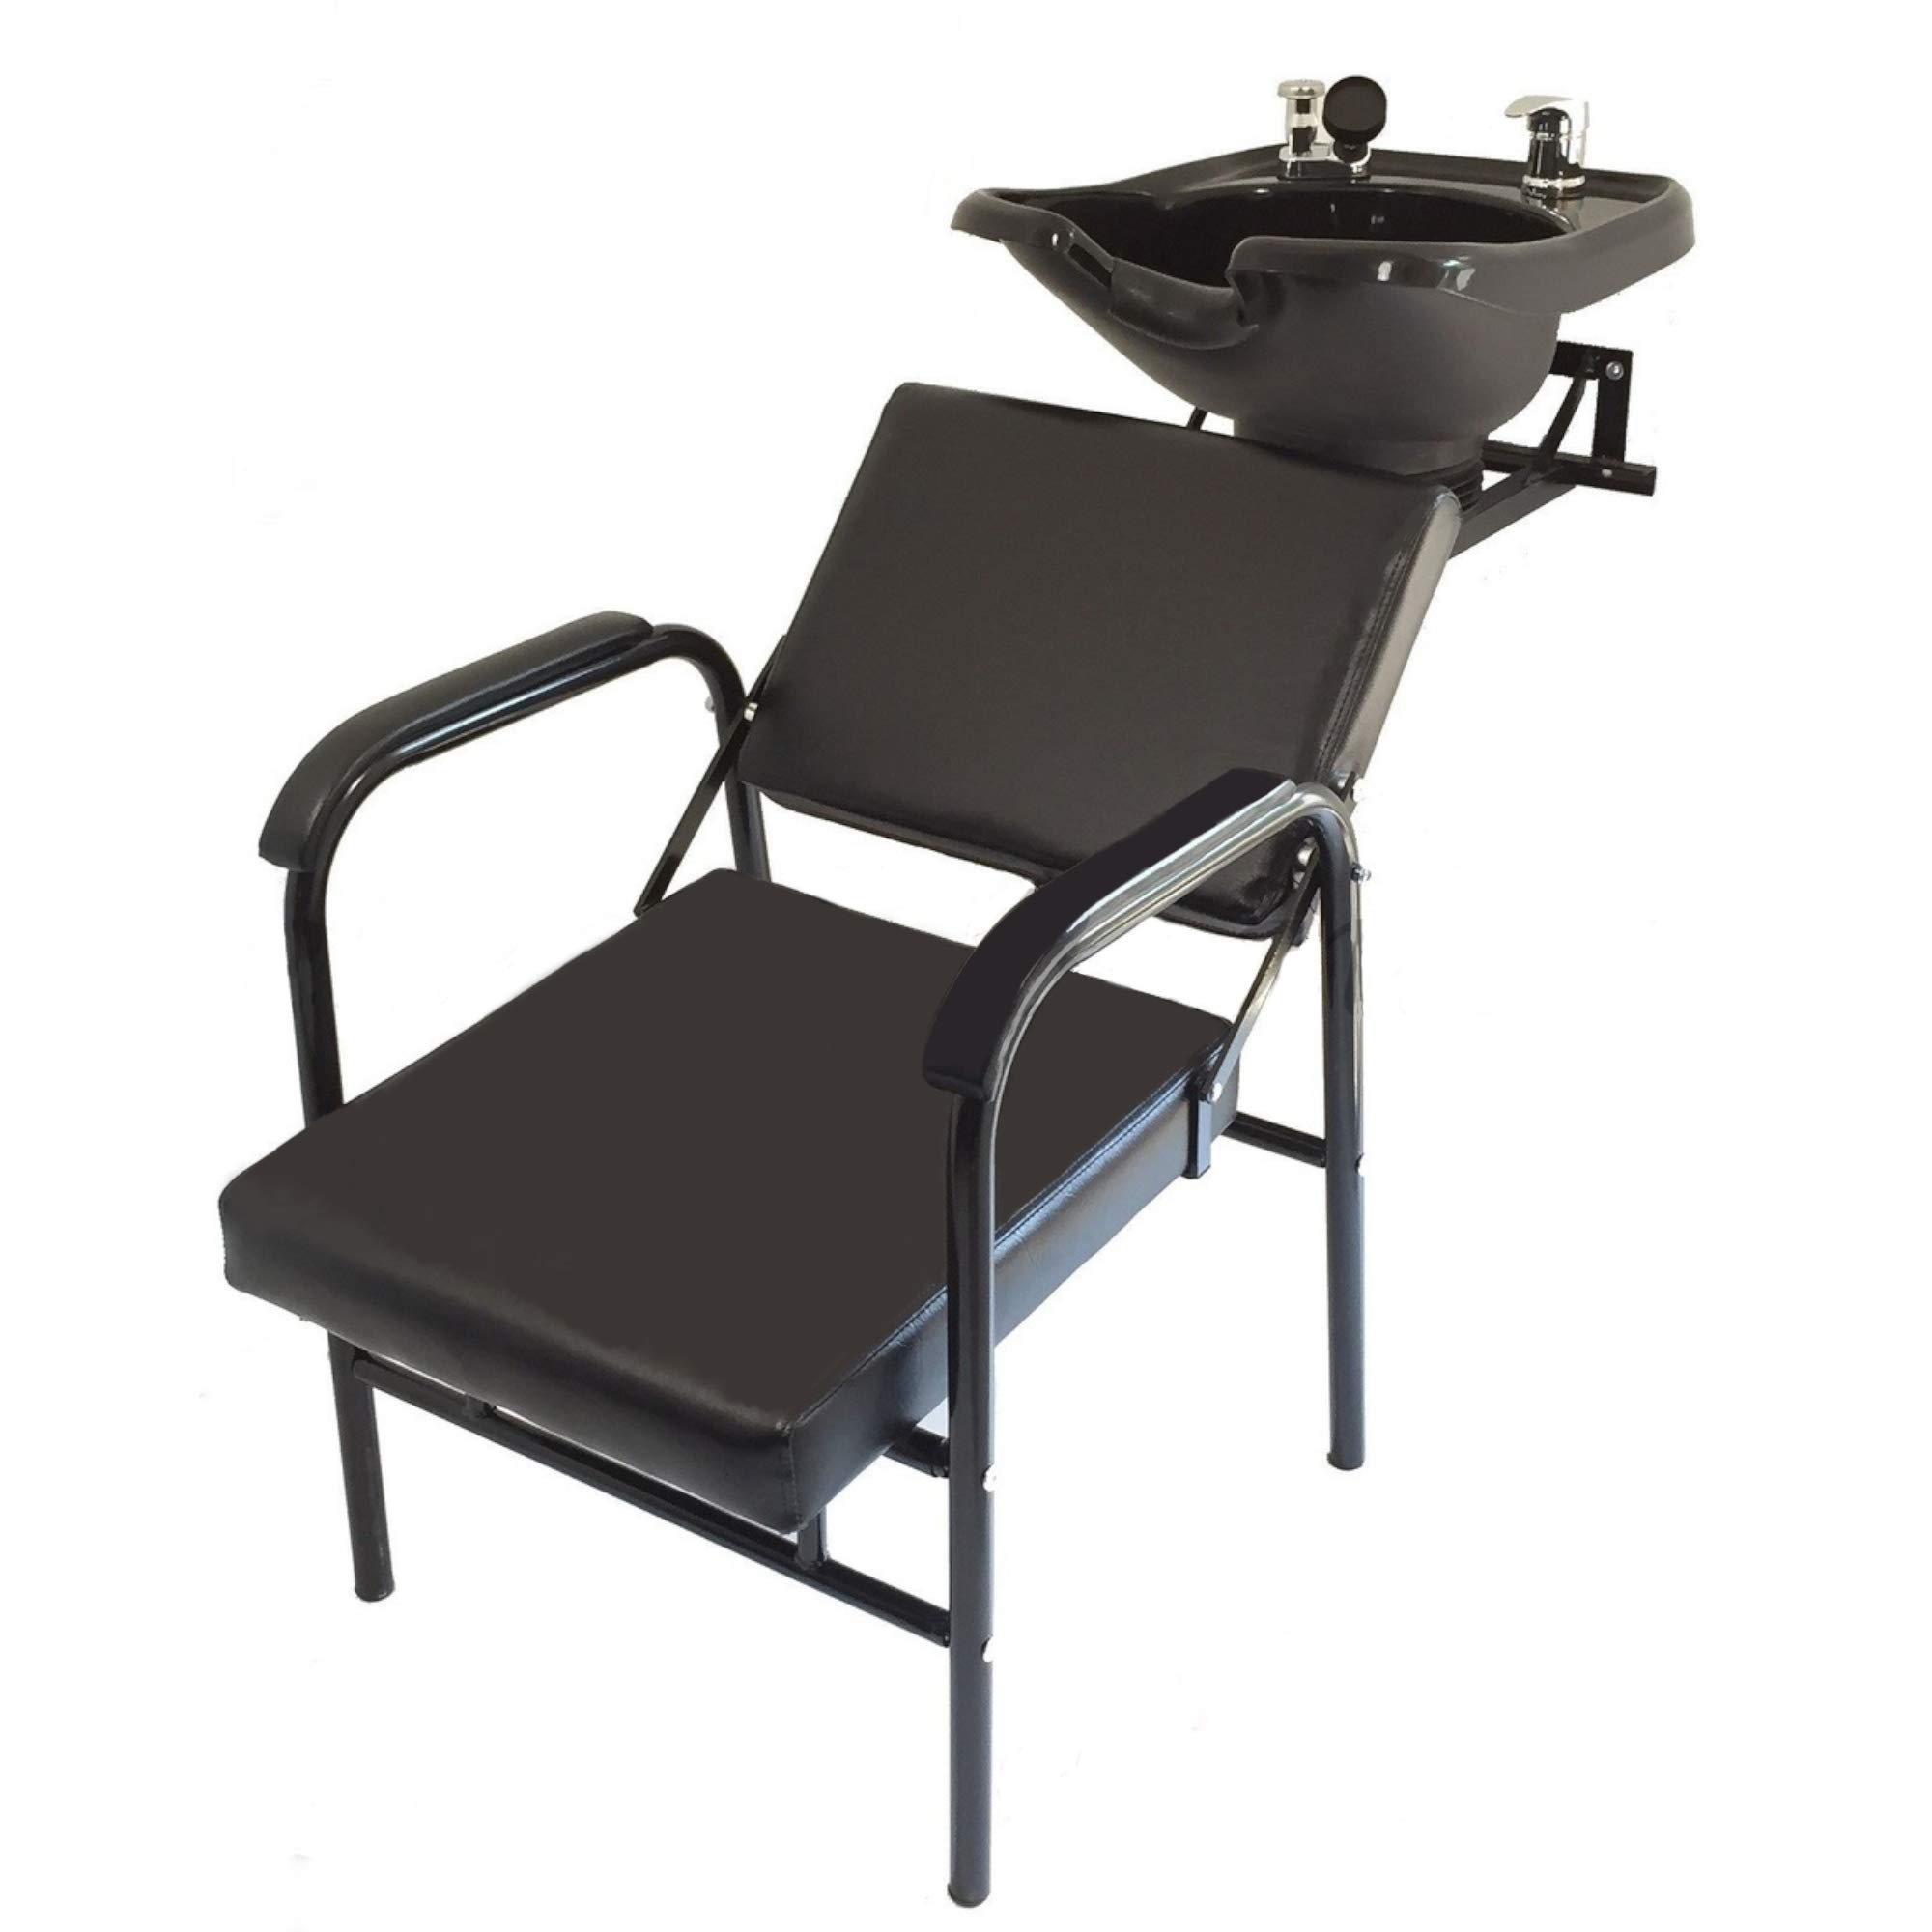 Salon Backwash Shampoo Tilt Bowl Sink Wall Mounted Reclining Shampoo Chair TLC-B13WT-216